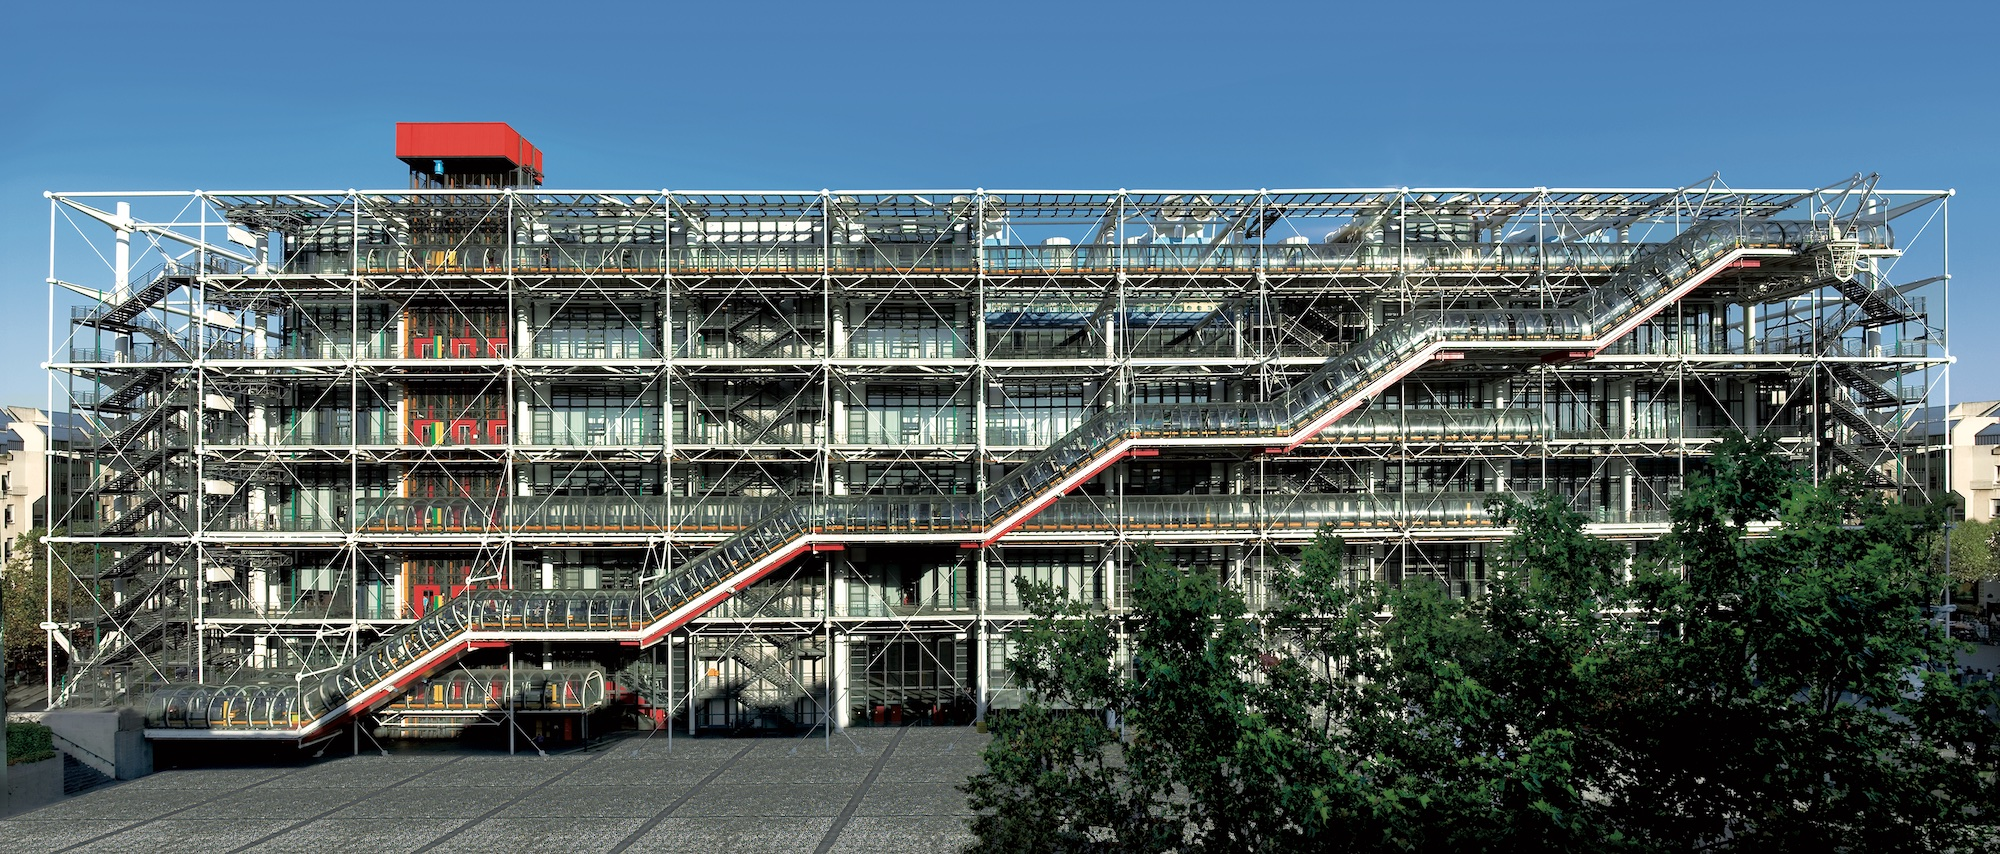 Centre Pompidou to Close, Undergo Four-Year Renovation – SURFACE